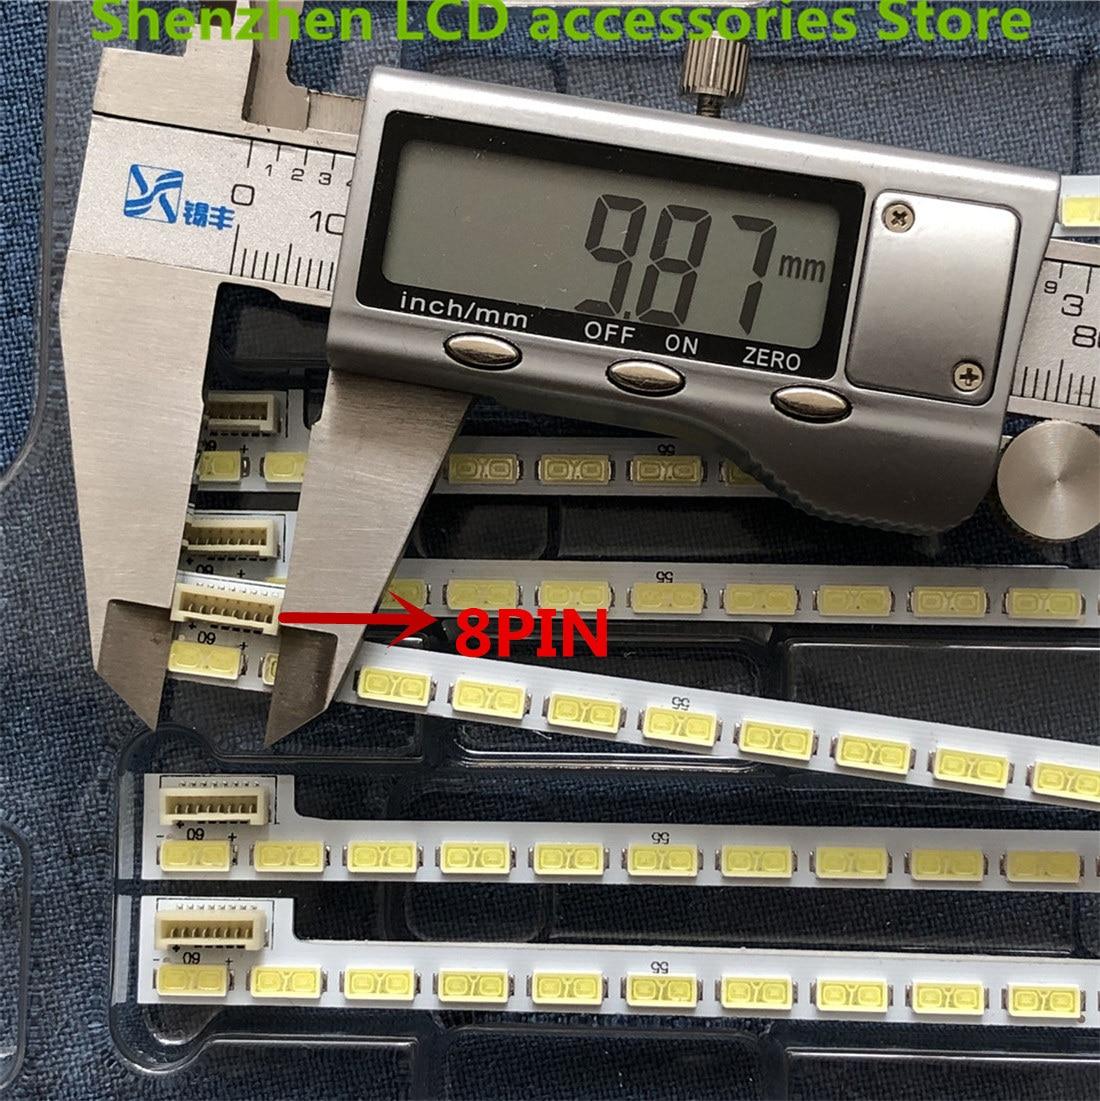 New 60LED 525mm LED Backlight Strip For LG 42LS570T T420HVN01.0 74.42T23.001 7030PKG 60ea 42LS5600 42LS560T 42LS570S 42LS575S